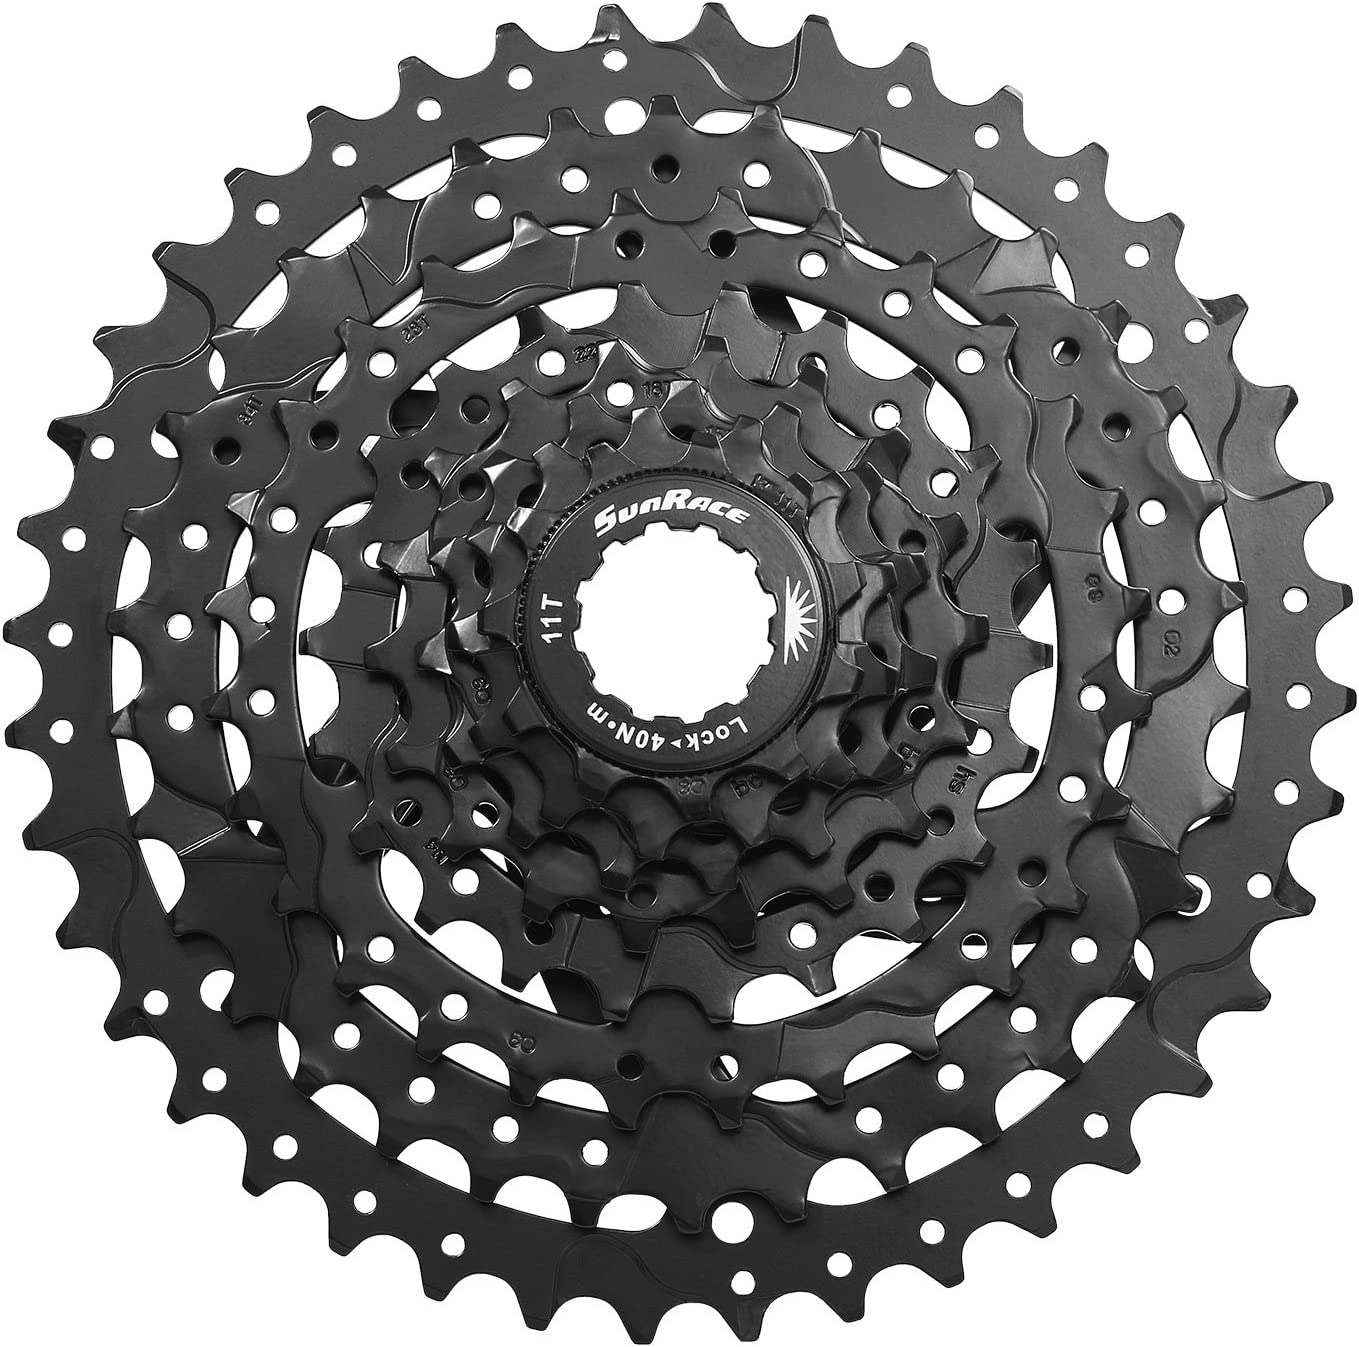 SunRace CSM680 M6 8 Speed Cassette Black 11-40T Bike